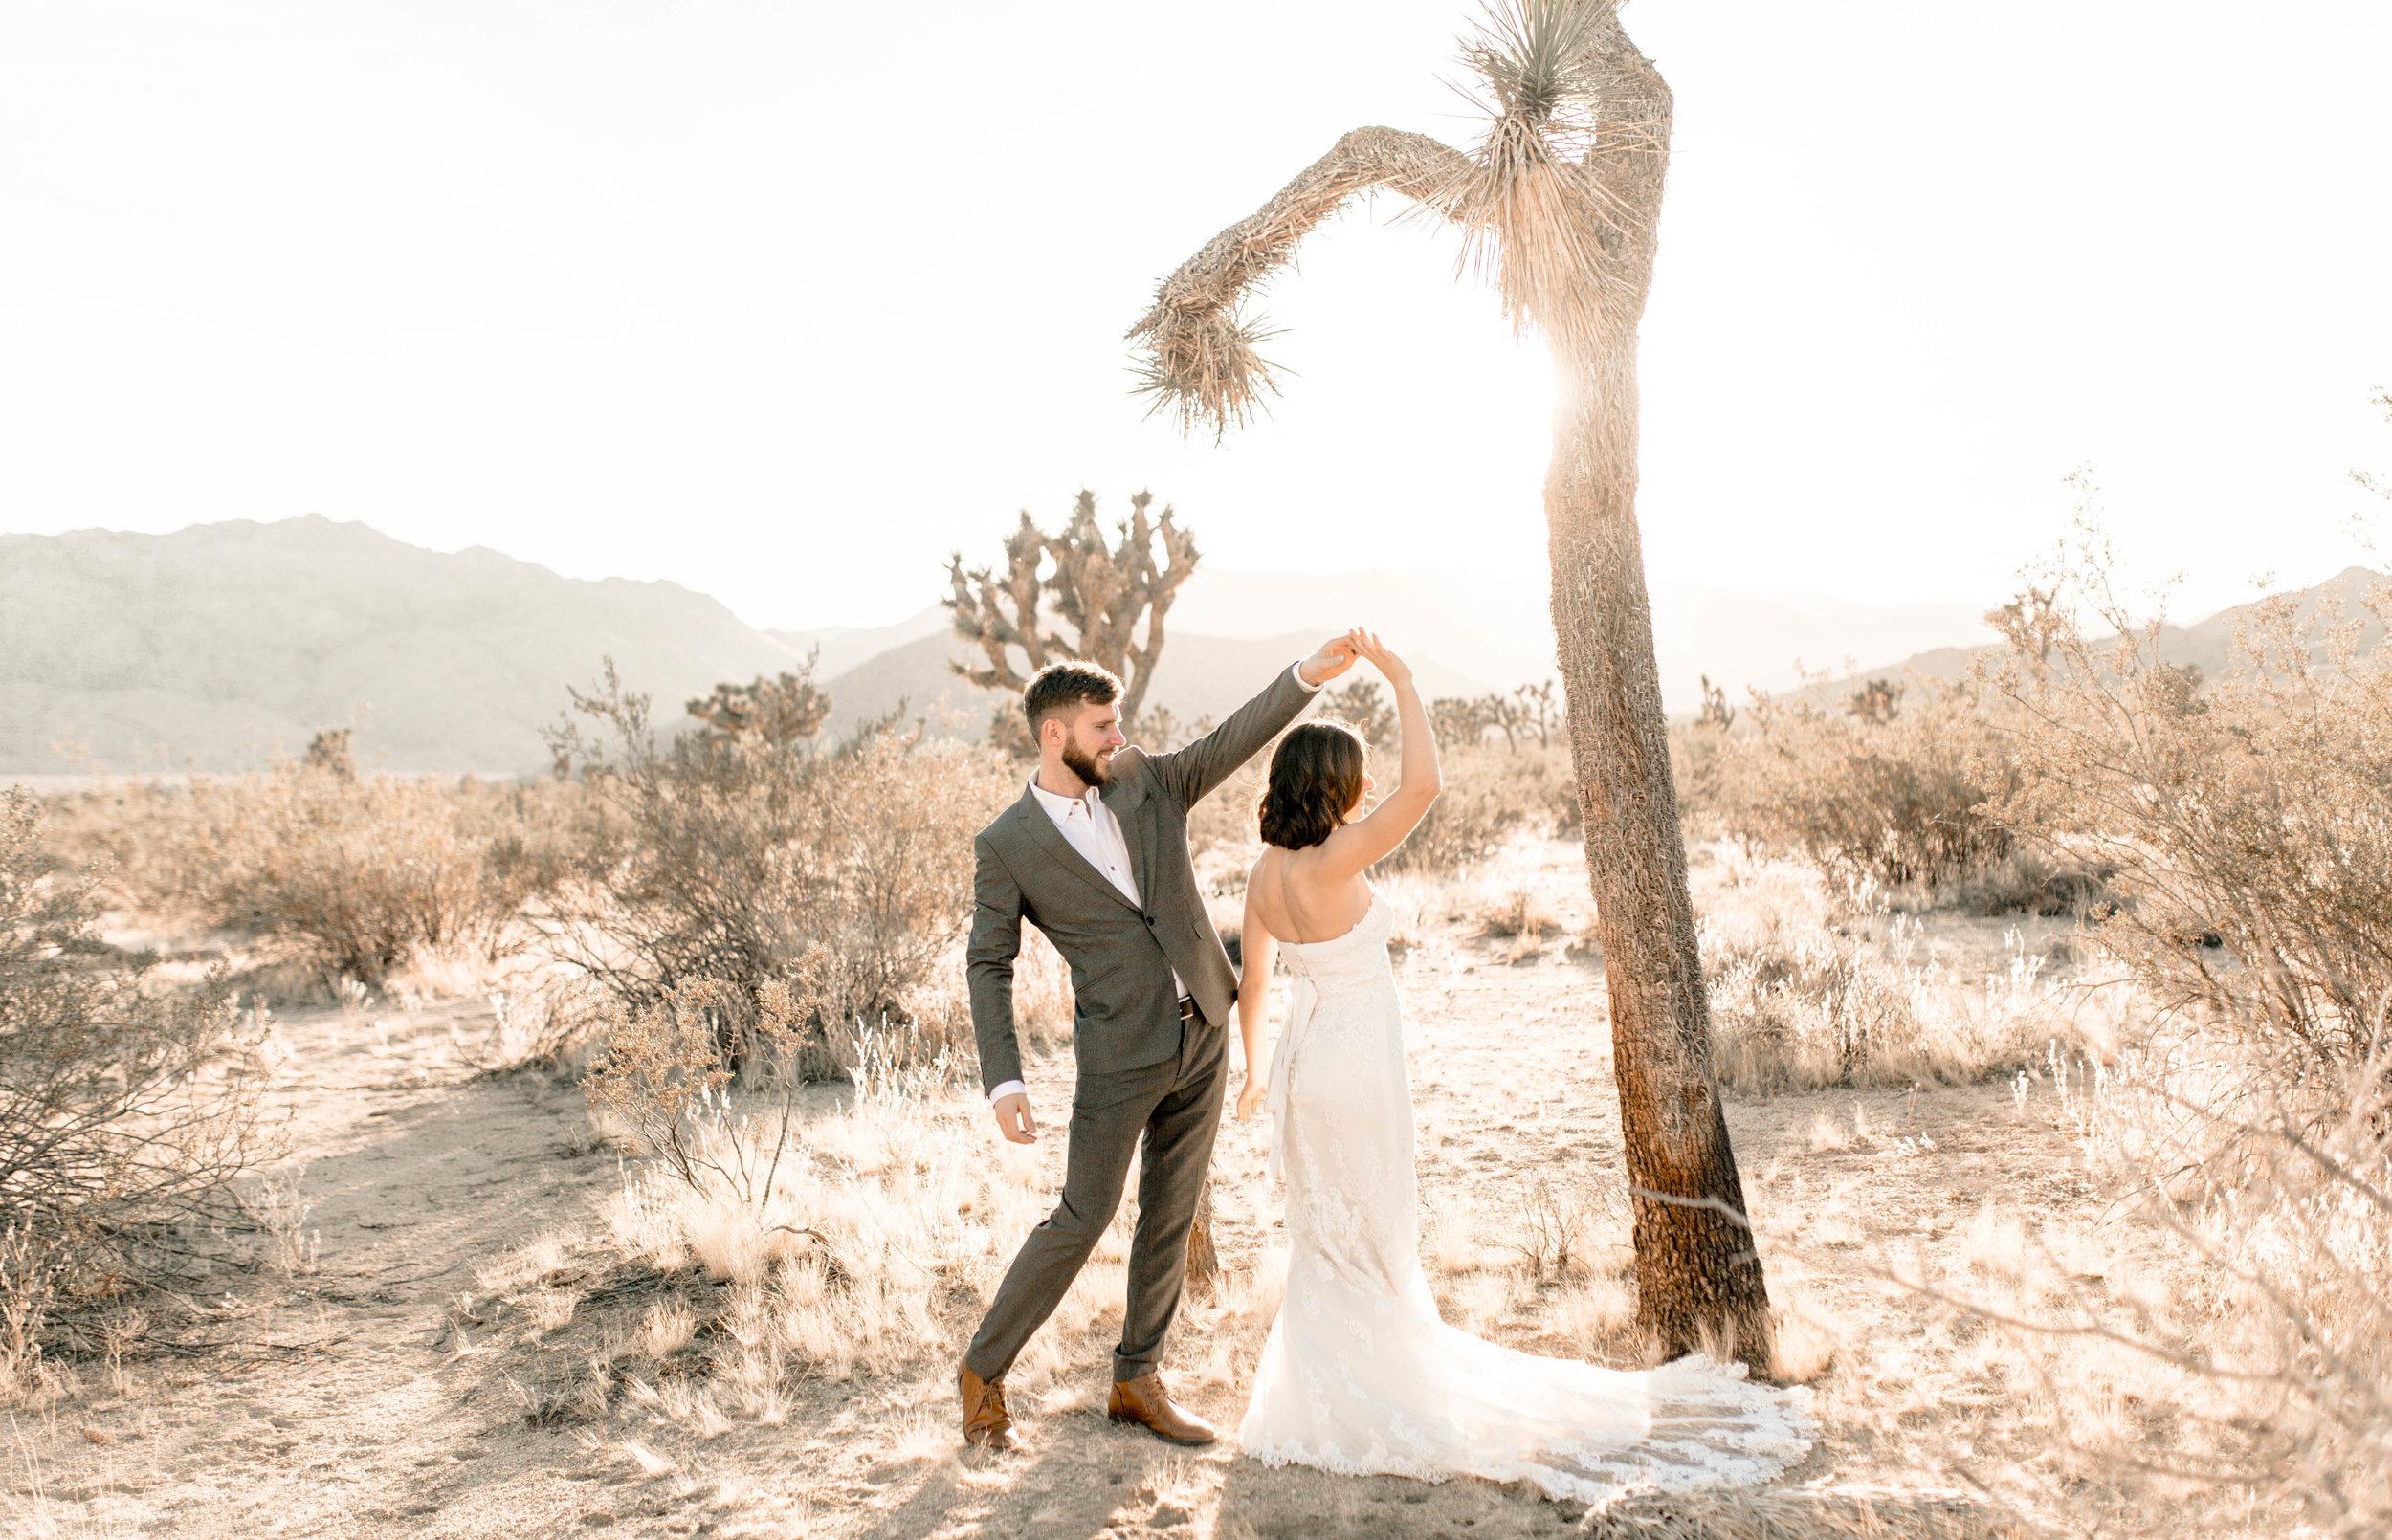 nicole-daacke-photography-joshua-tree-adventurous-elopement-wedding-national-park-wedding-photographer-adventure-wedding-adventurous-elopement-jtree-joshua-tree-national-park-wedding-photographer-intimate-weddings-golden-desert-love-4.jpg